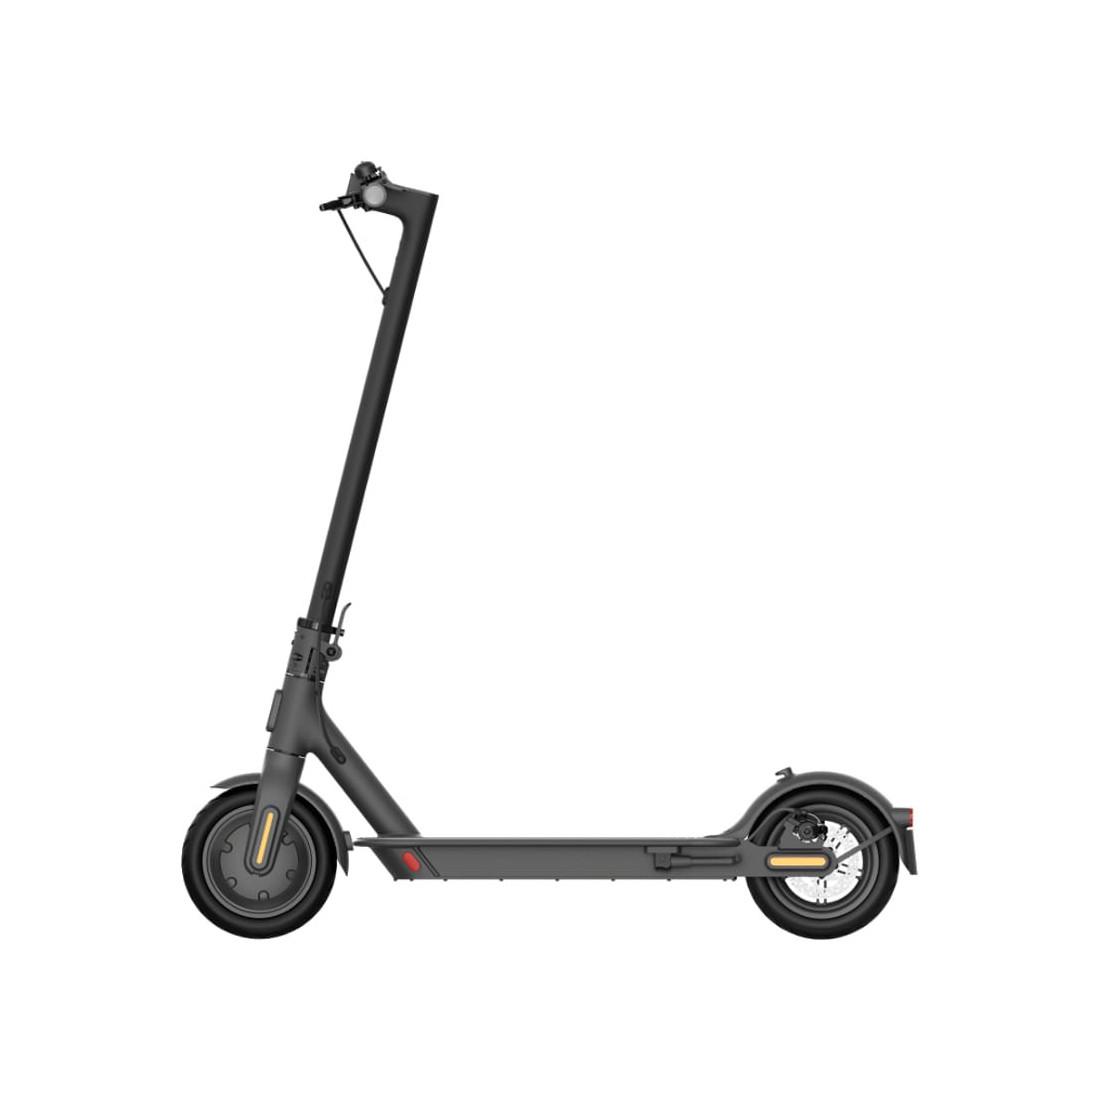 Электросамокат Xiaomi MiJia Smart Electric Scooter Essential - фото 4